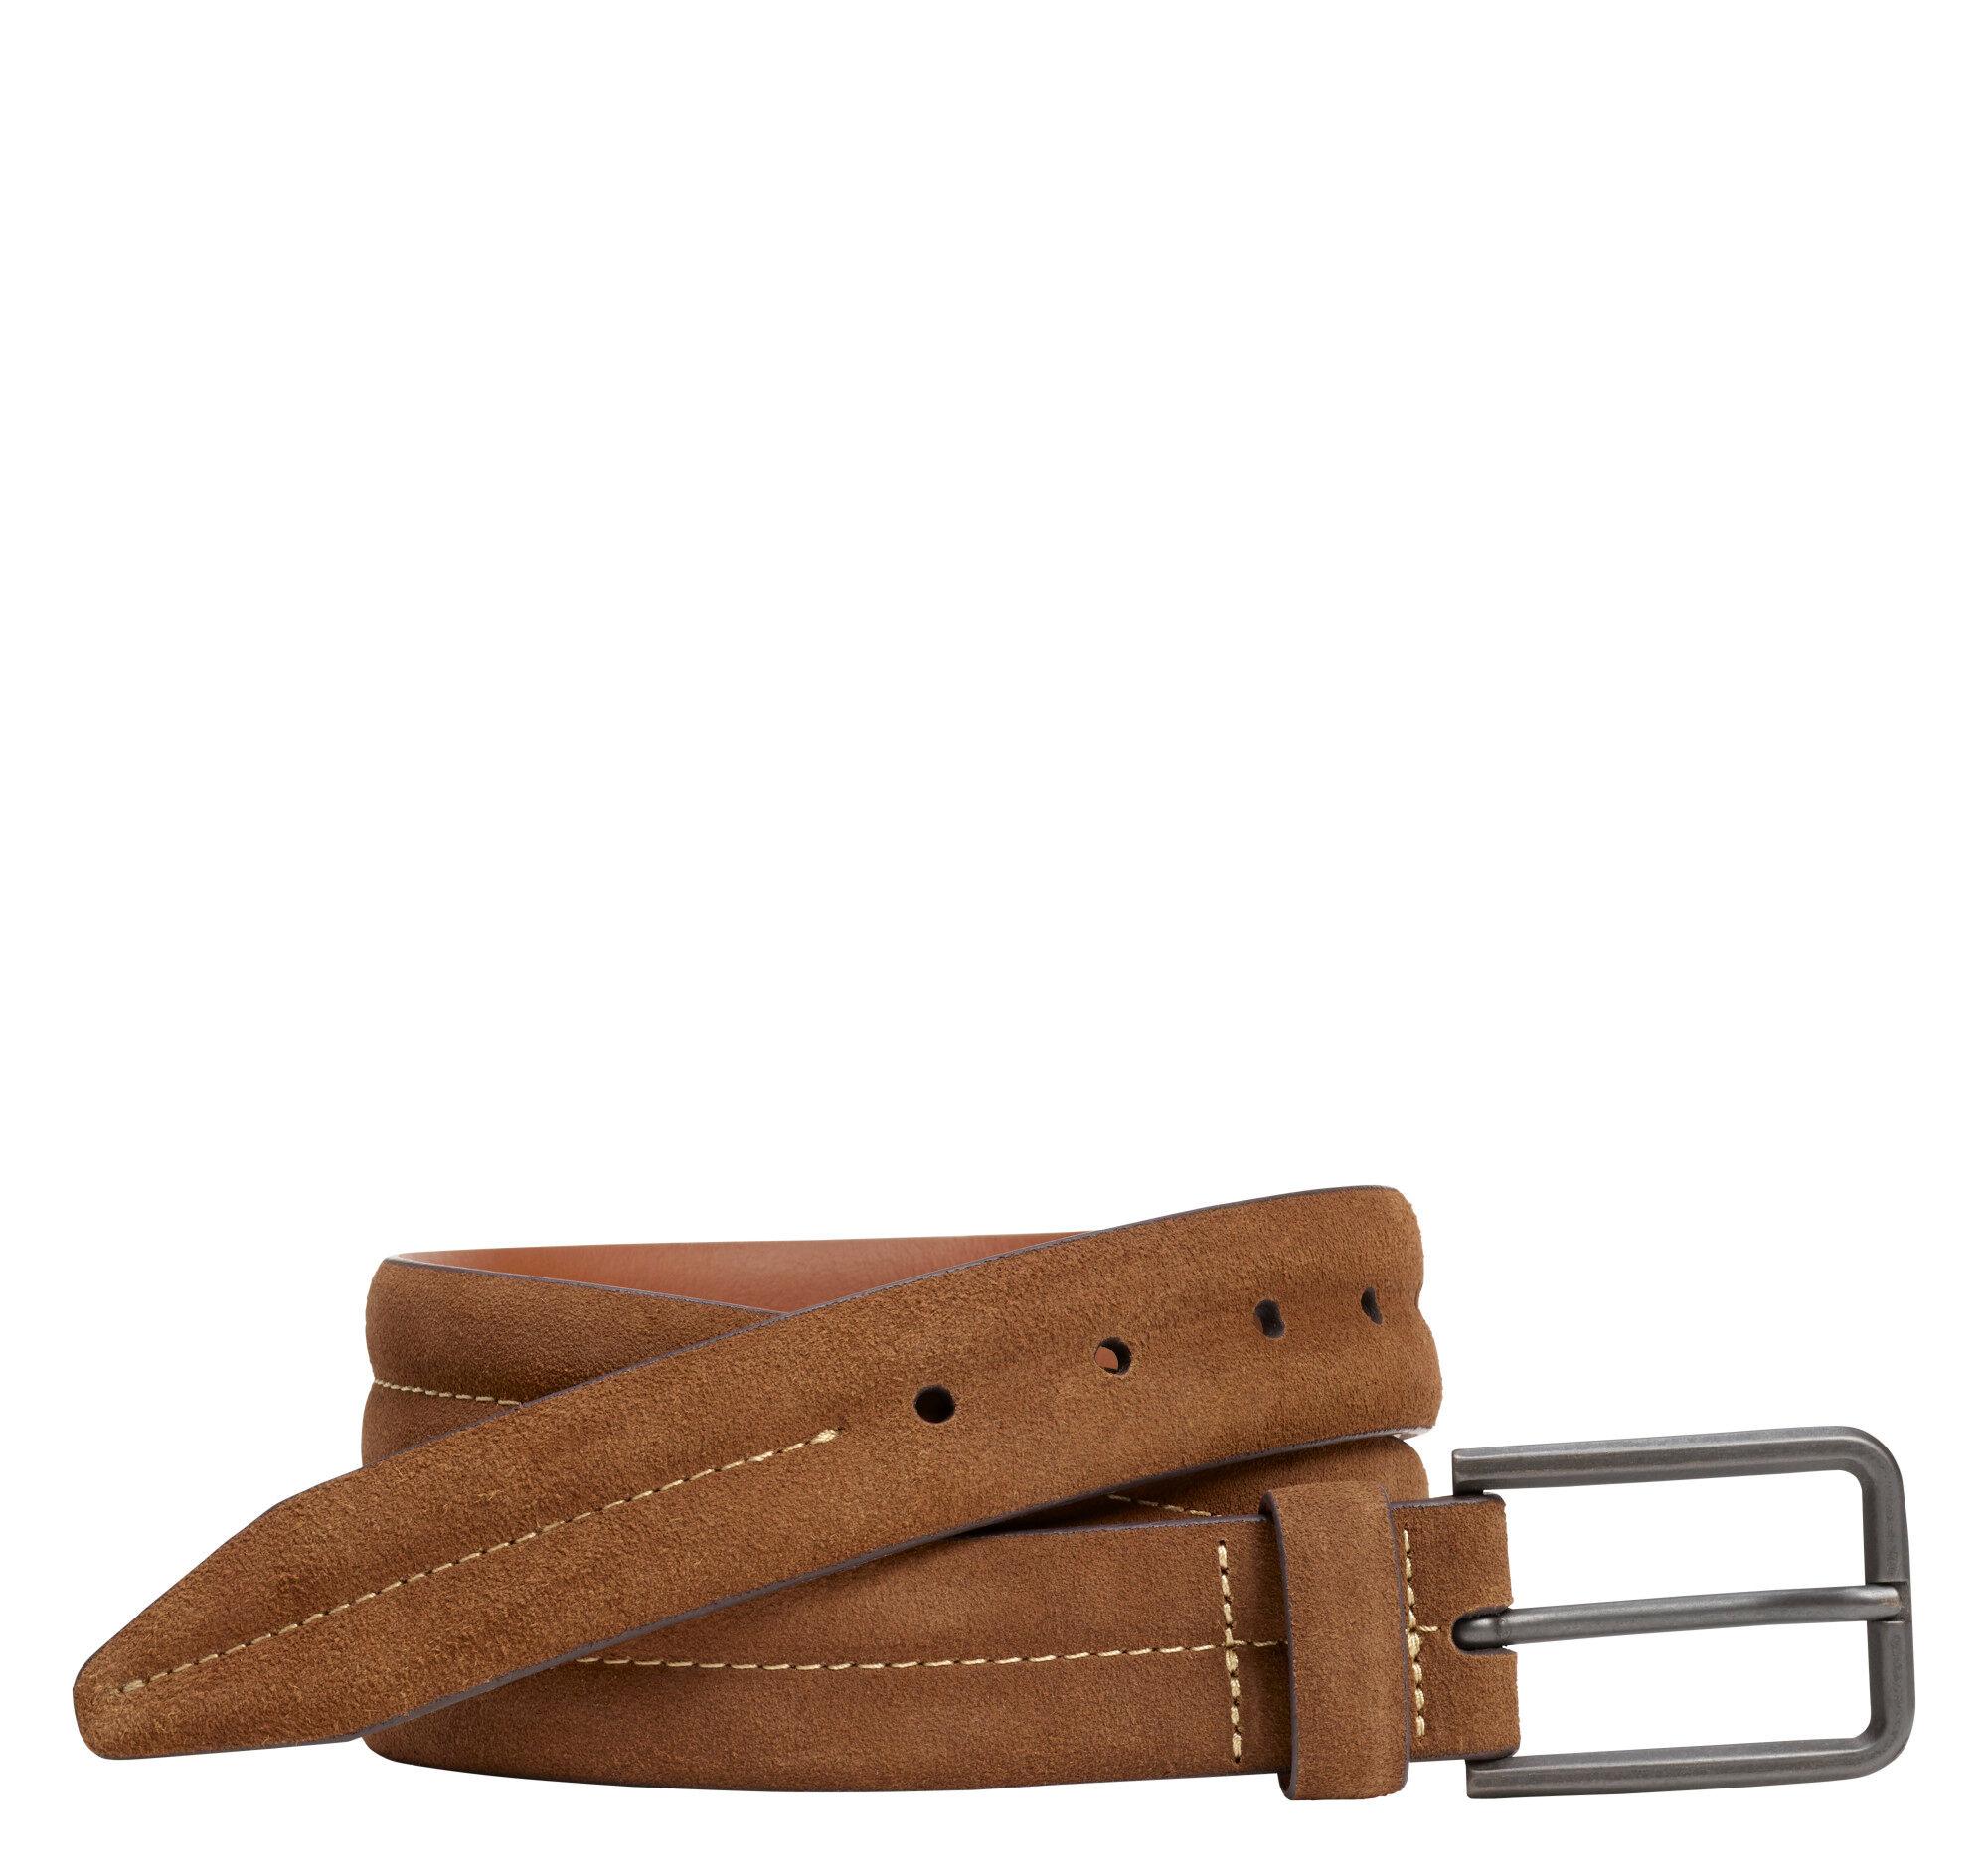 Johnston & Murphy Men's Center-Stitched Distressed Belt - Cinnamon - Size 44